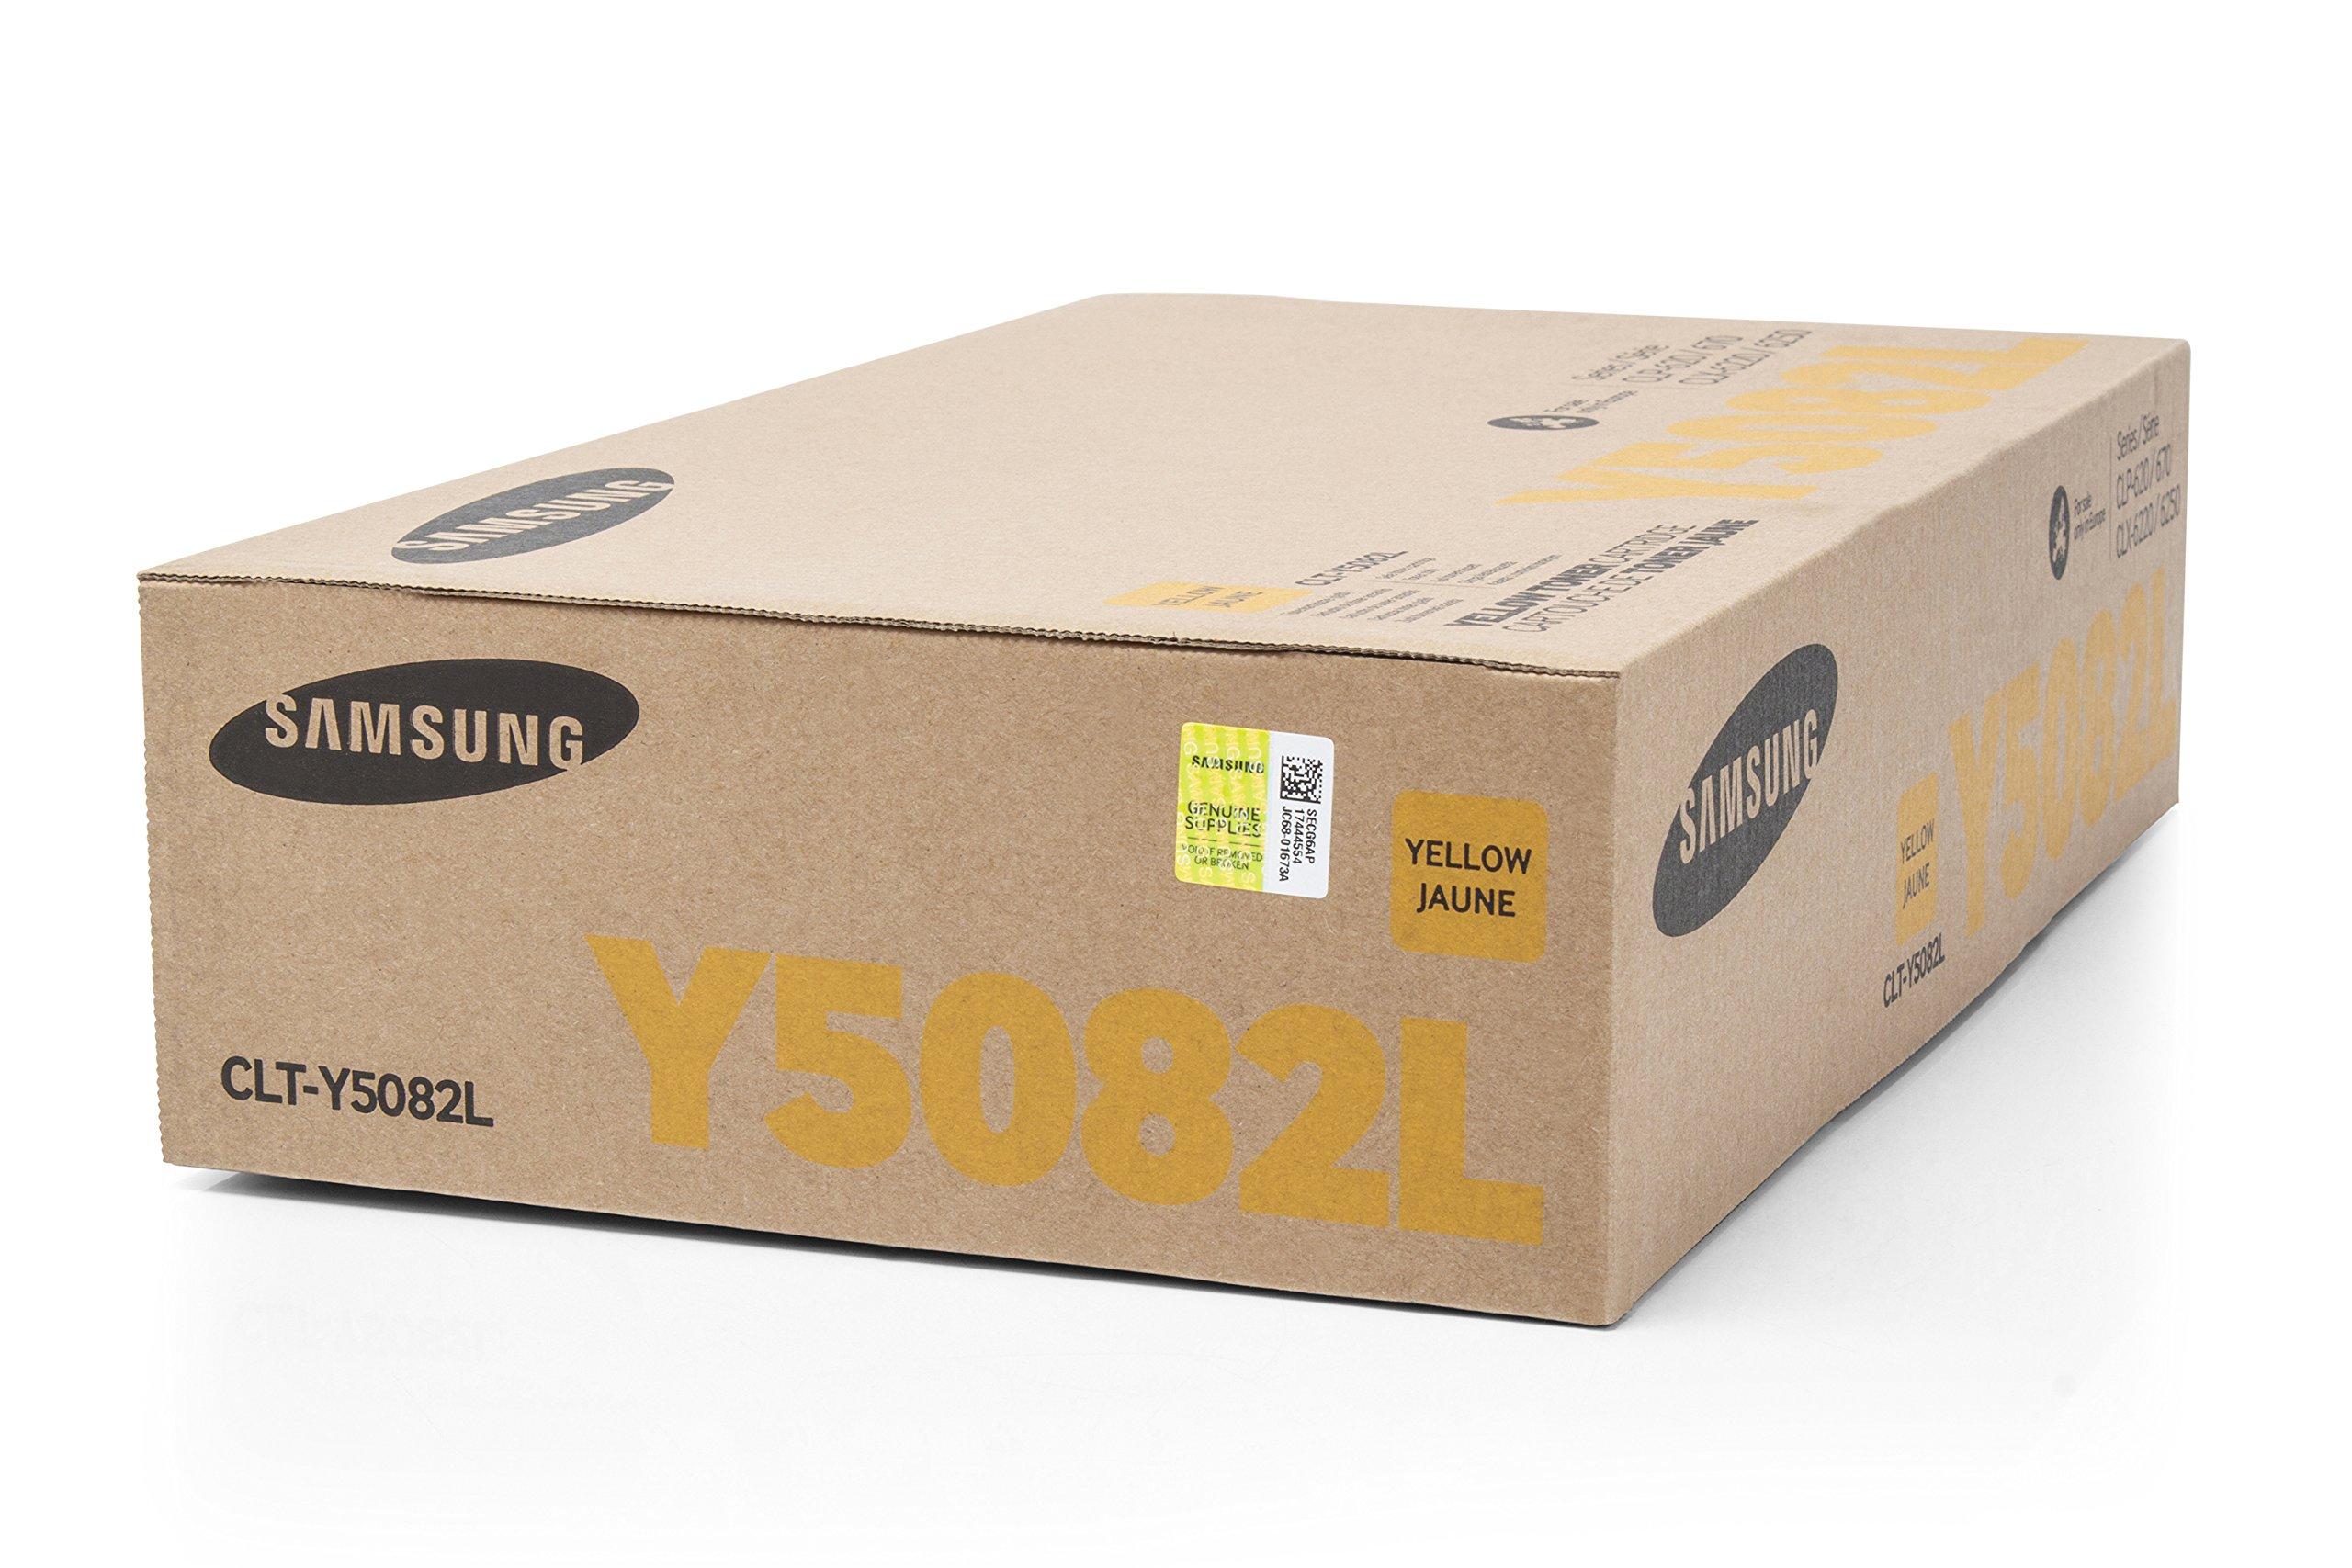 Original XXL Toner compatibile con SAMSUNG CLP 670�Series Samsung Y5082L CLTY5082L, CLT-Y5082L, clt